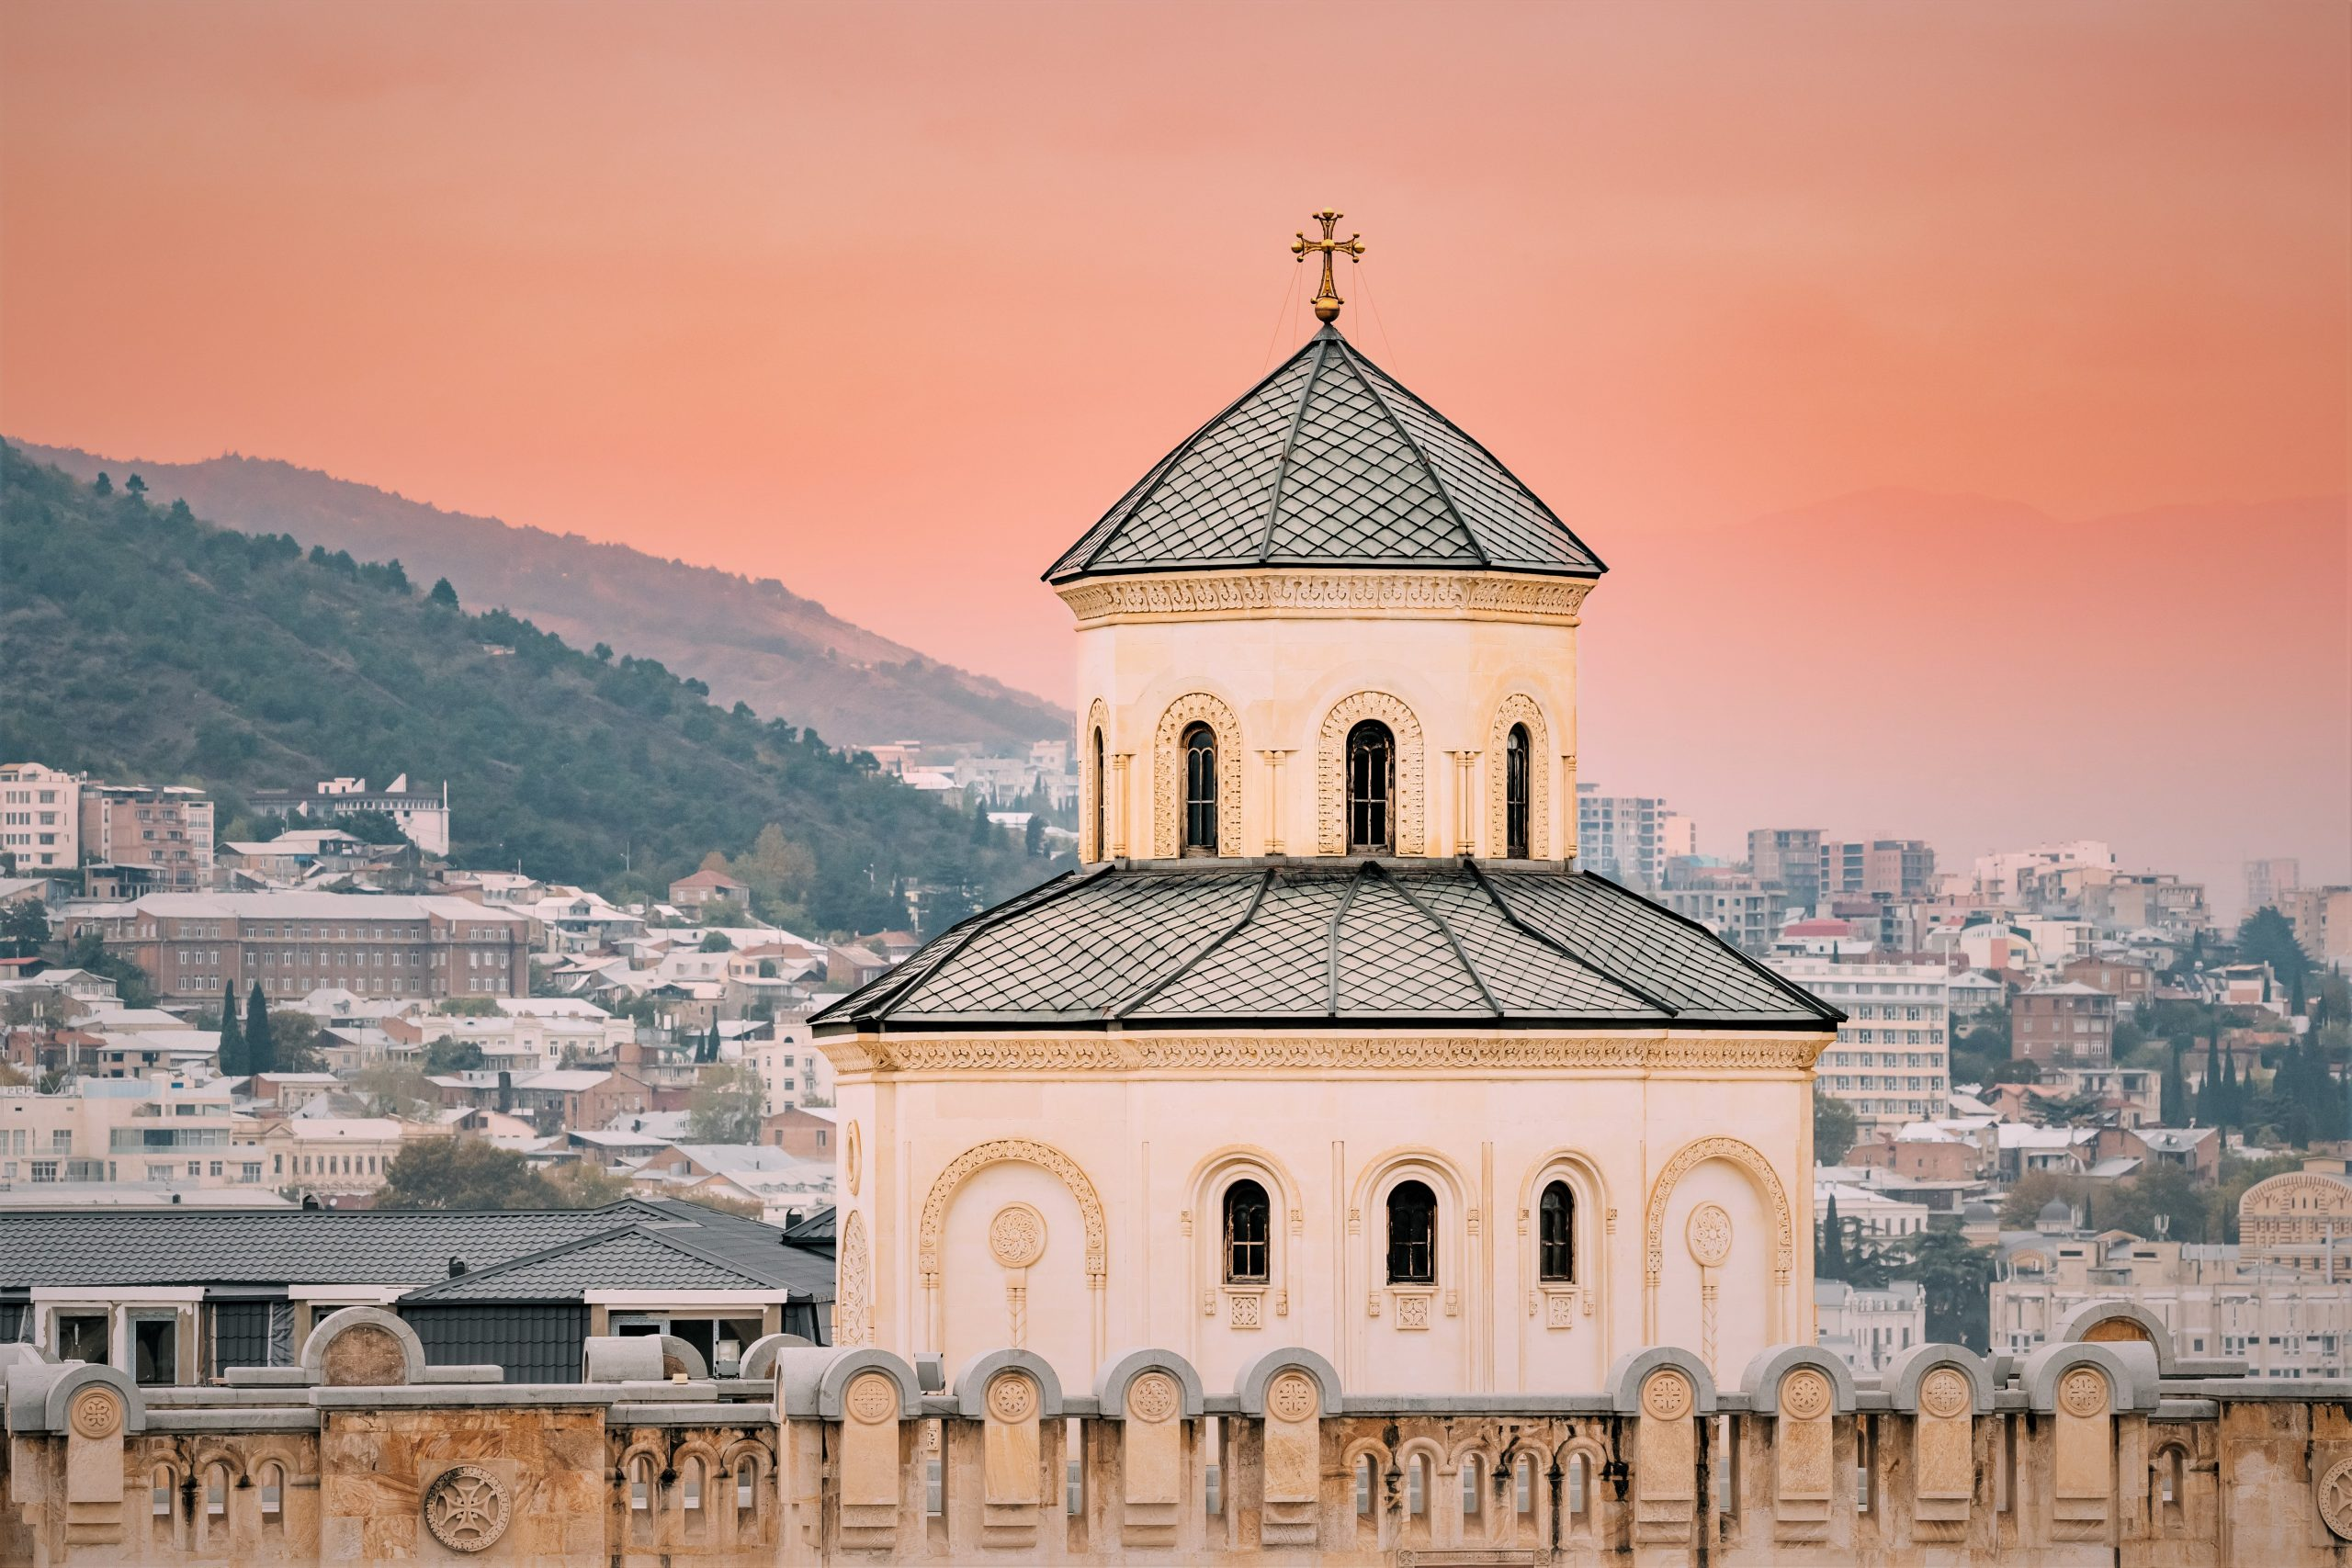 tbilisi georgia exterior of the holy trinity cathe CD32RY scaled Грузинская Православная Церковь Грузинская Православная Церковь